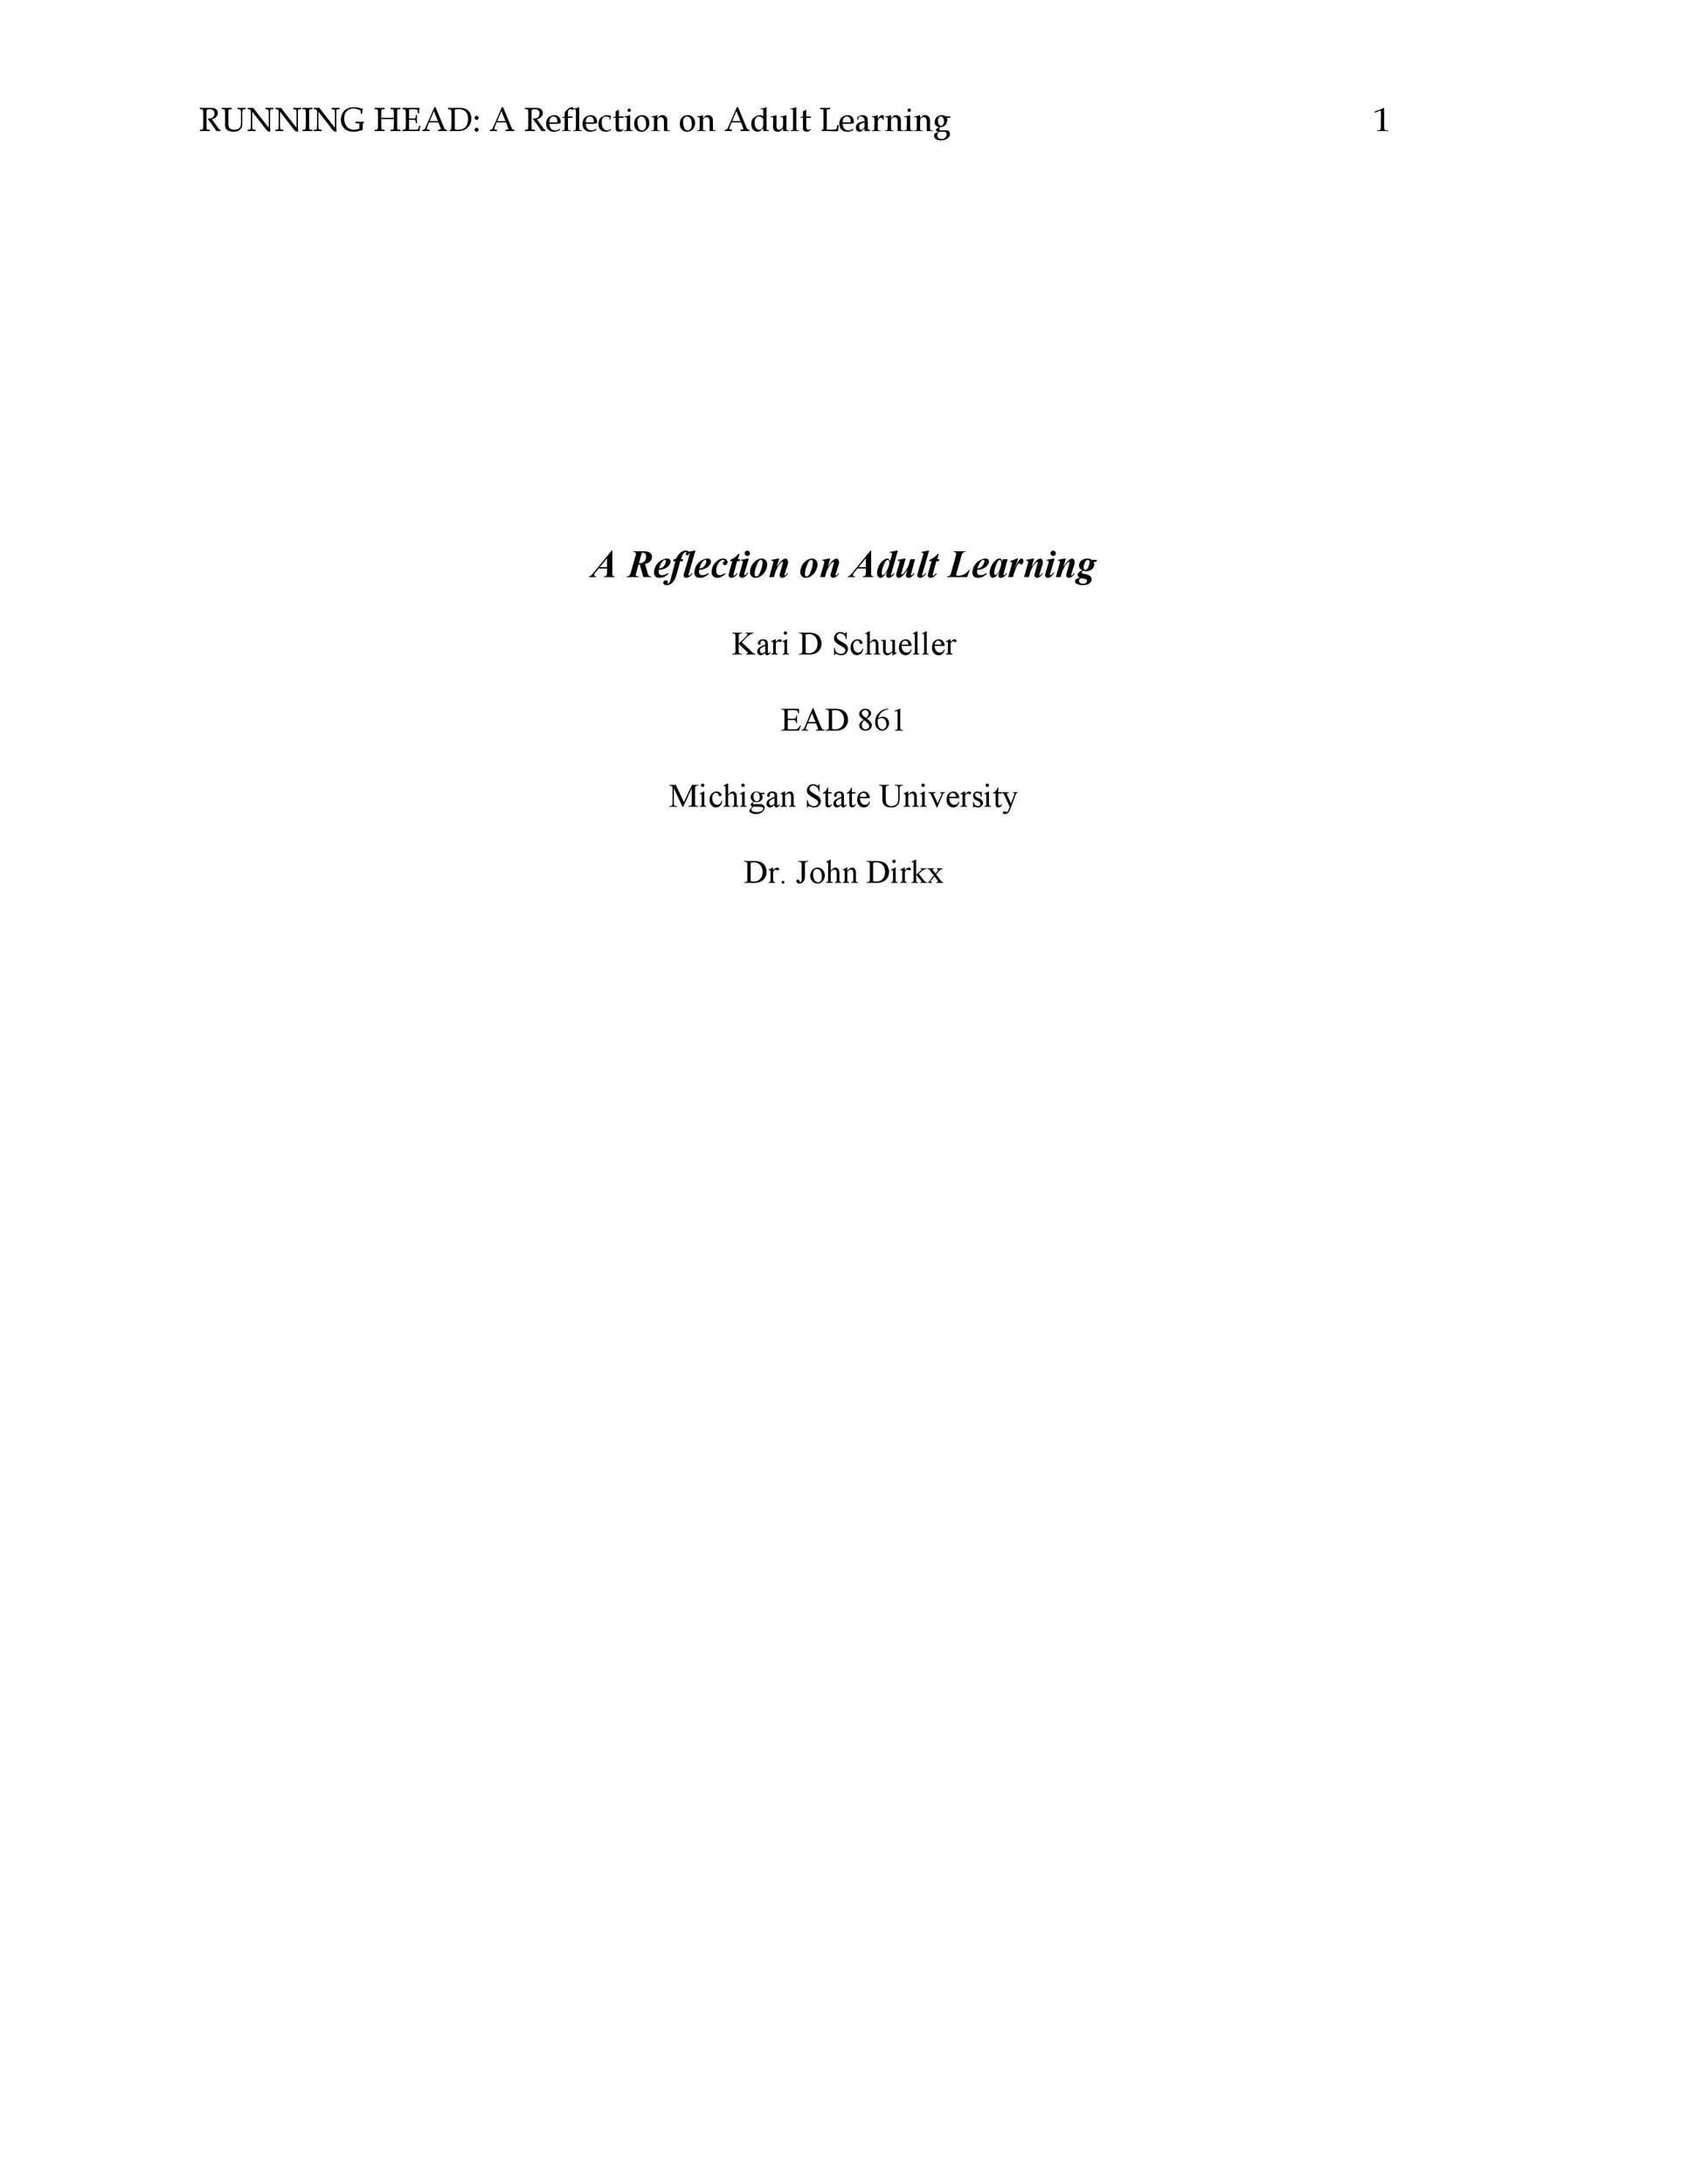 Free reflective essay example 34